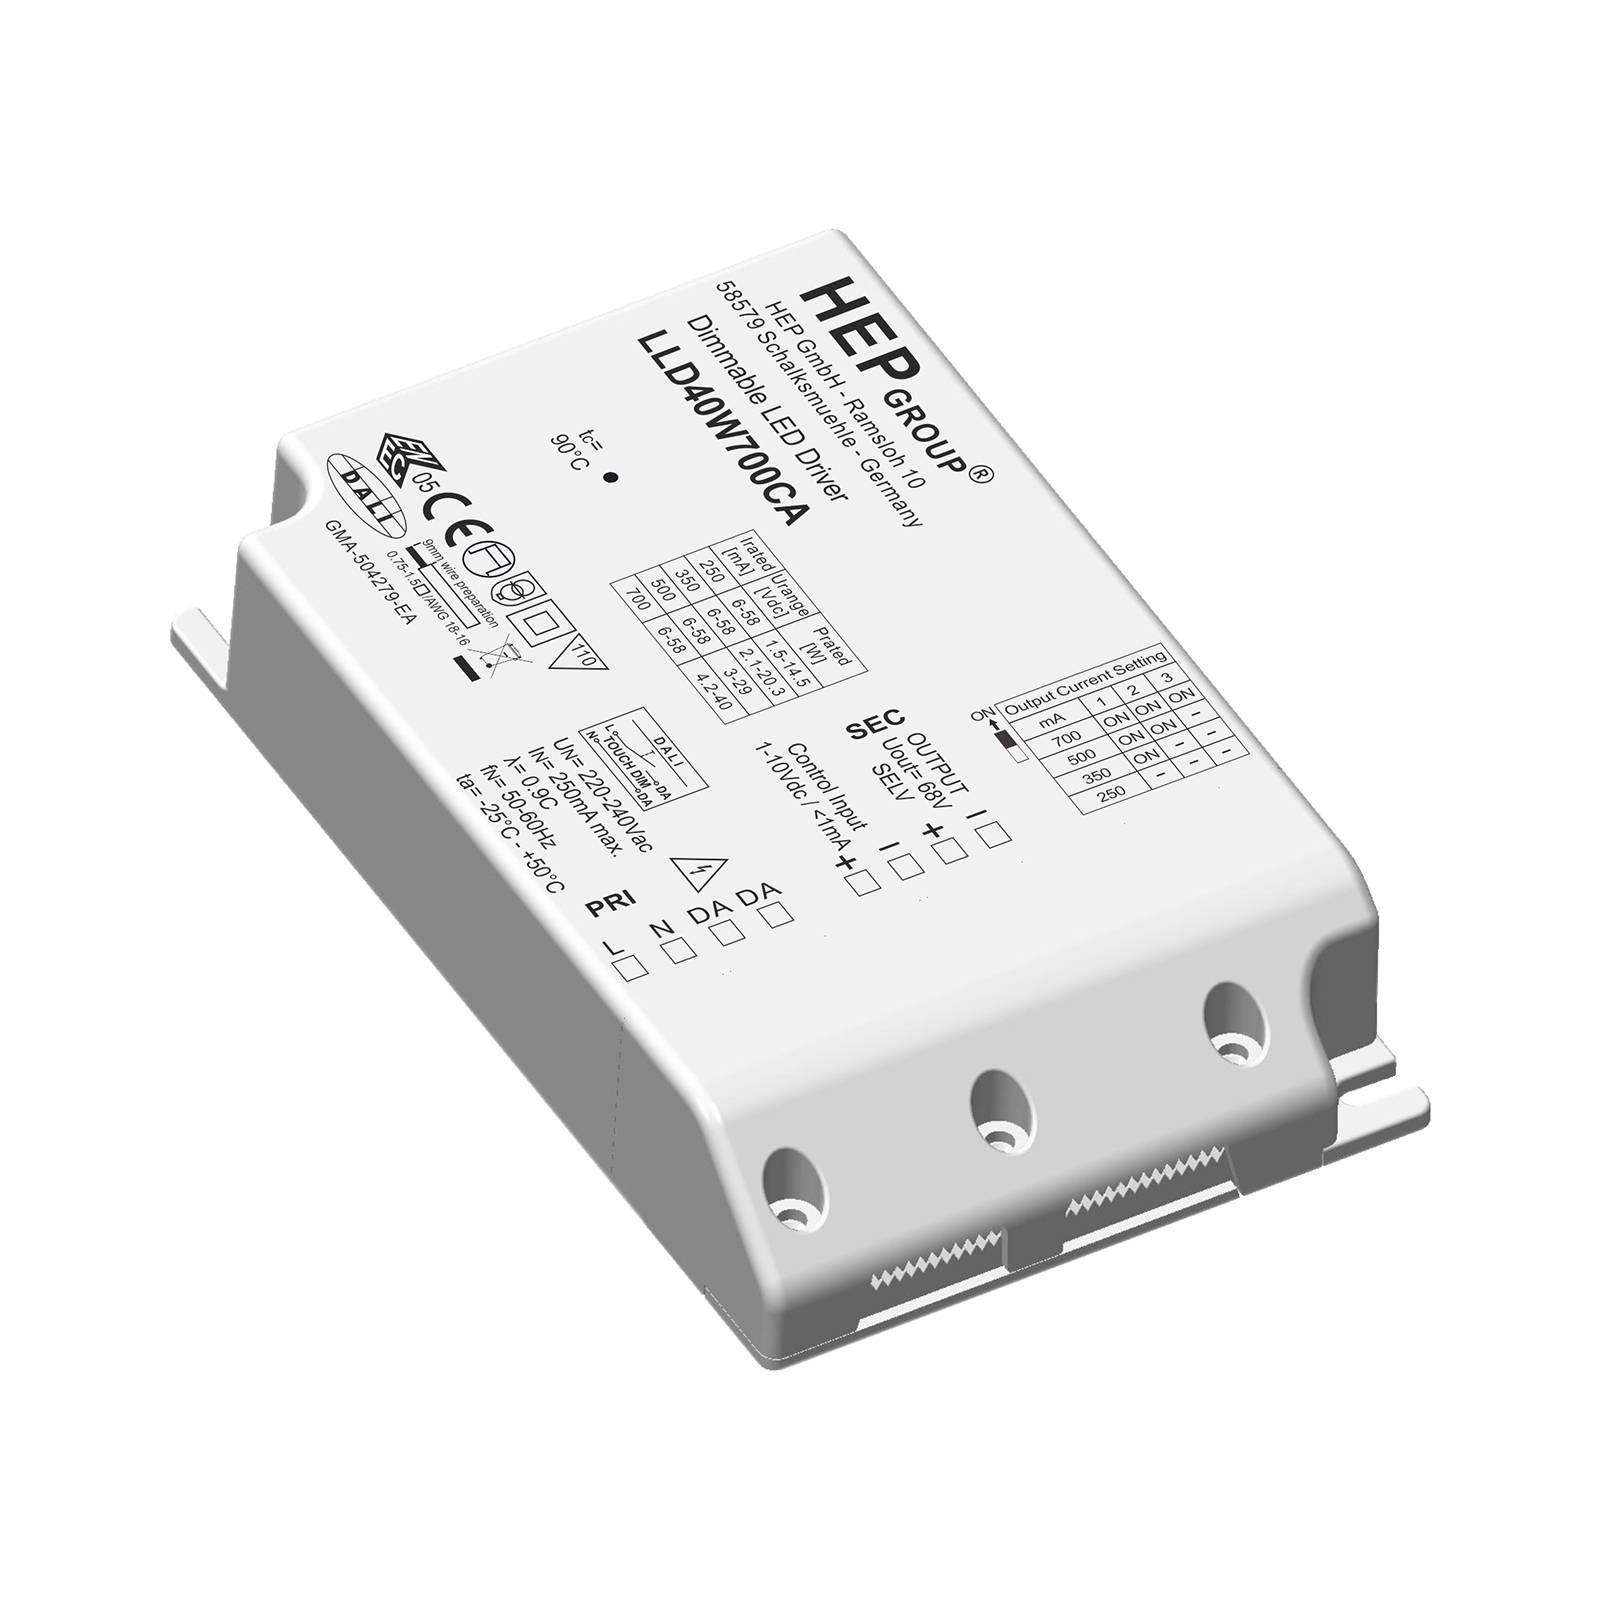 Driver LED LLD, 40 W, 700 mA, dimming, CC